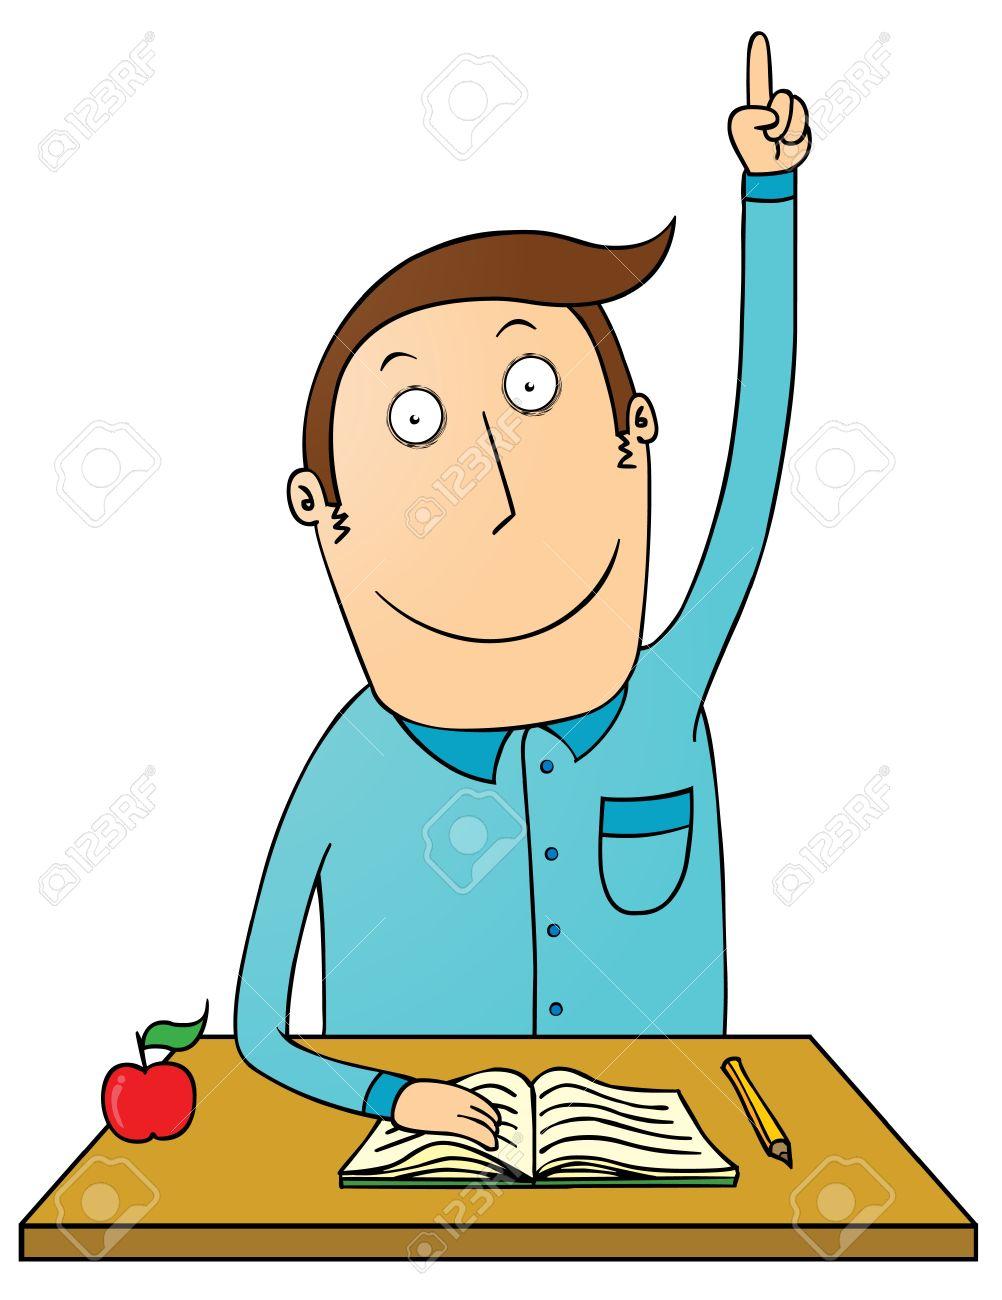 raising hand student royalty free cliparts, vectors, and stock